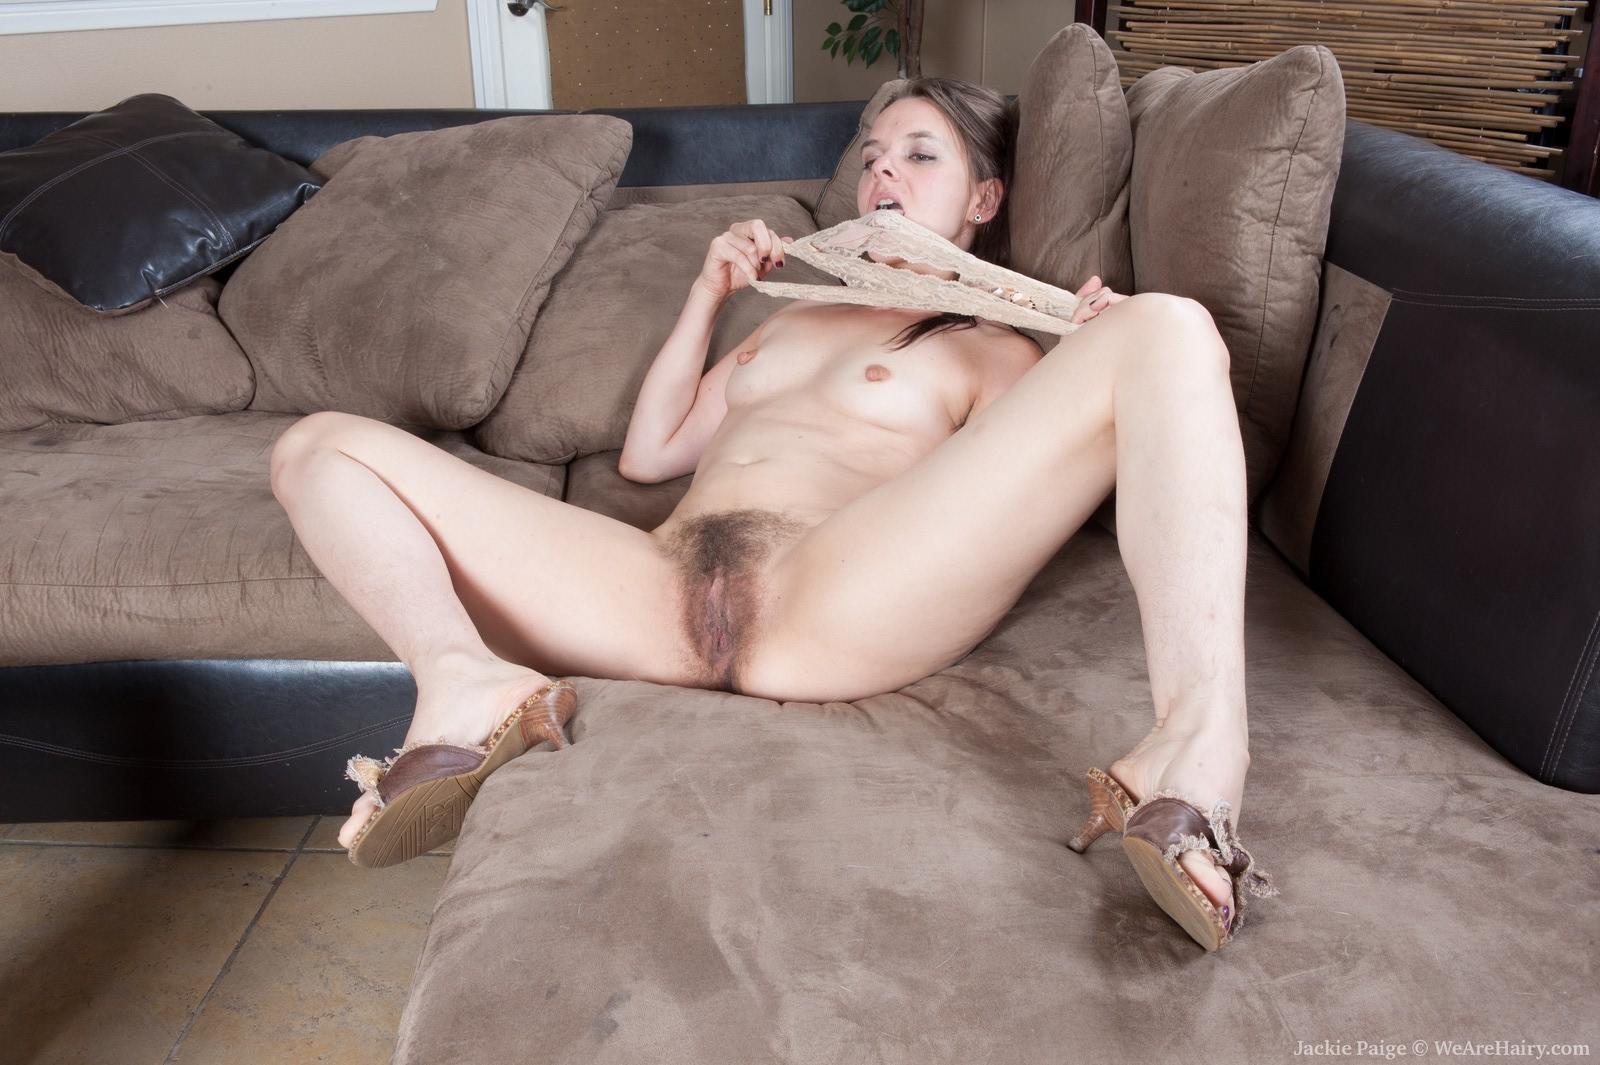 Girls nud in you tube